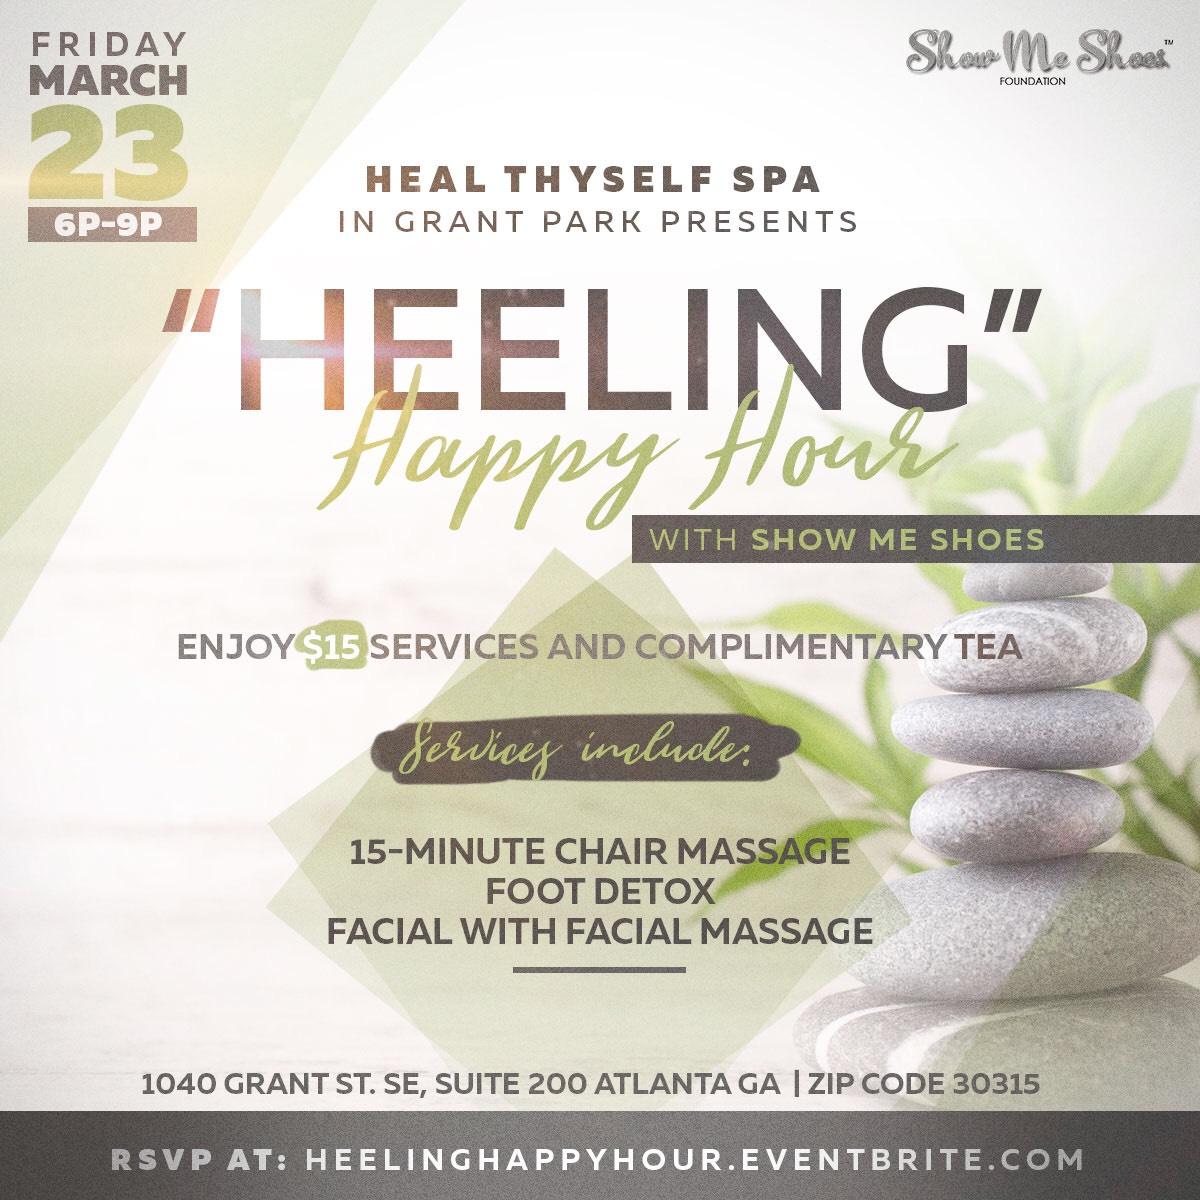 Heeling Happy Hour at Heal Thyself Spa